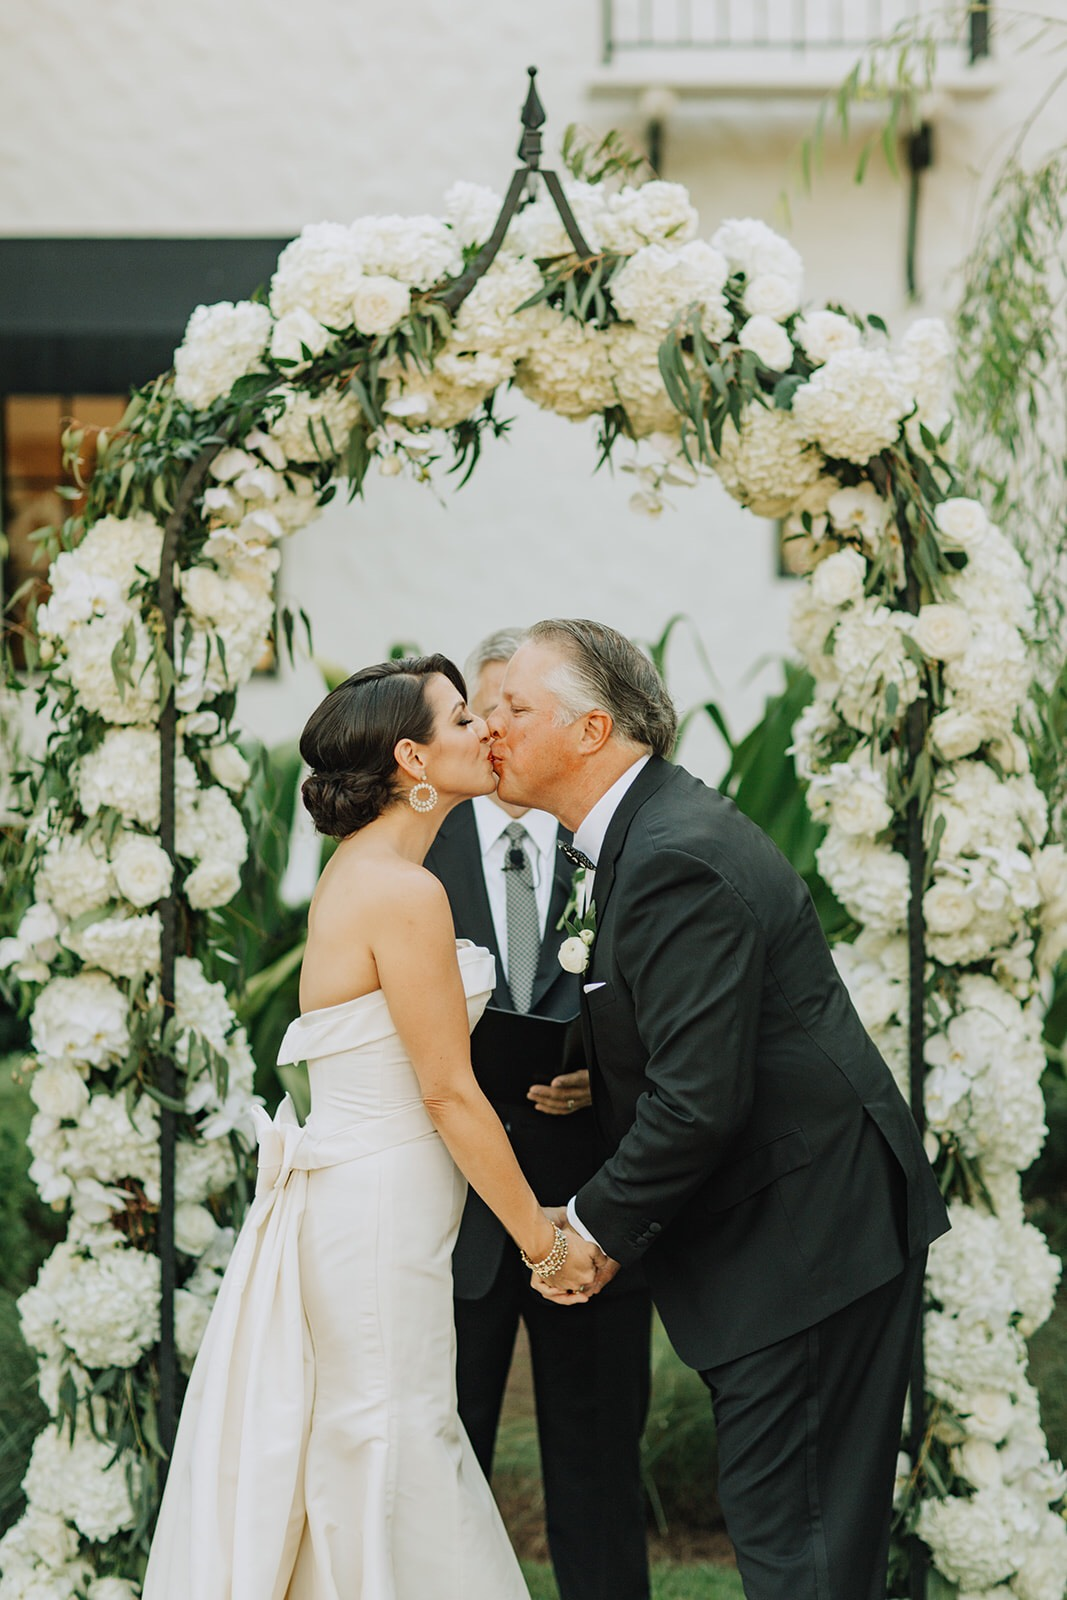 Padgett McCormick wearing Carolina Herrera silk faille wedding dress